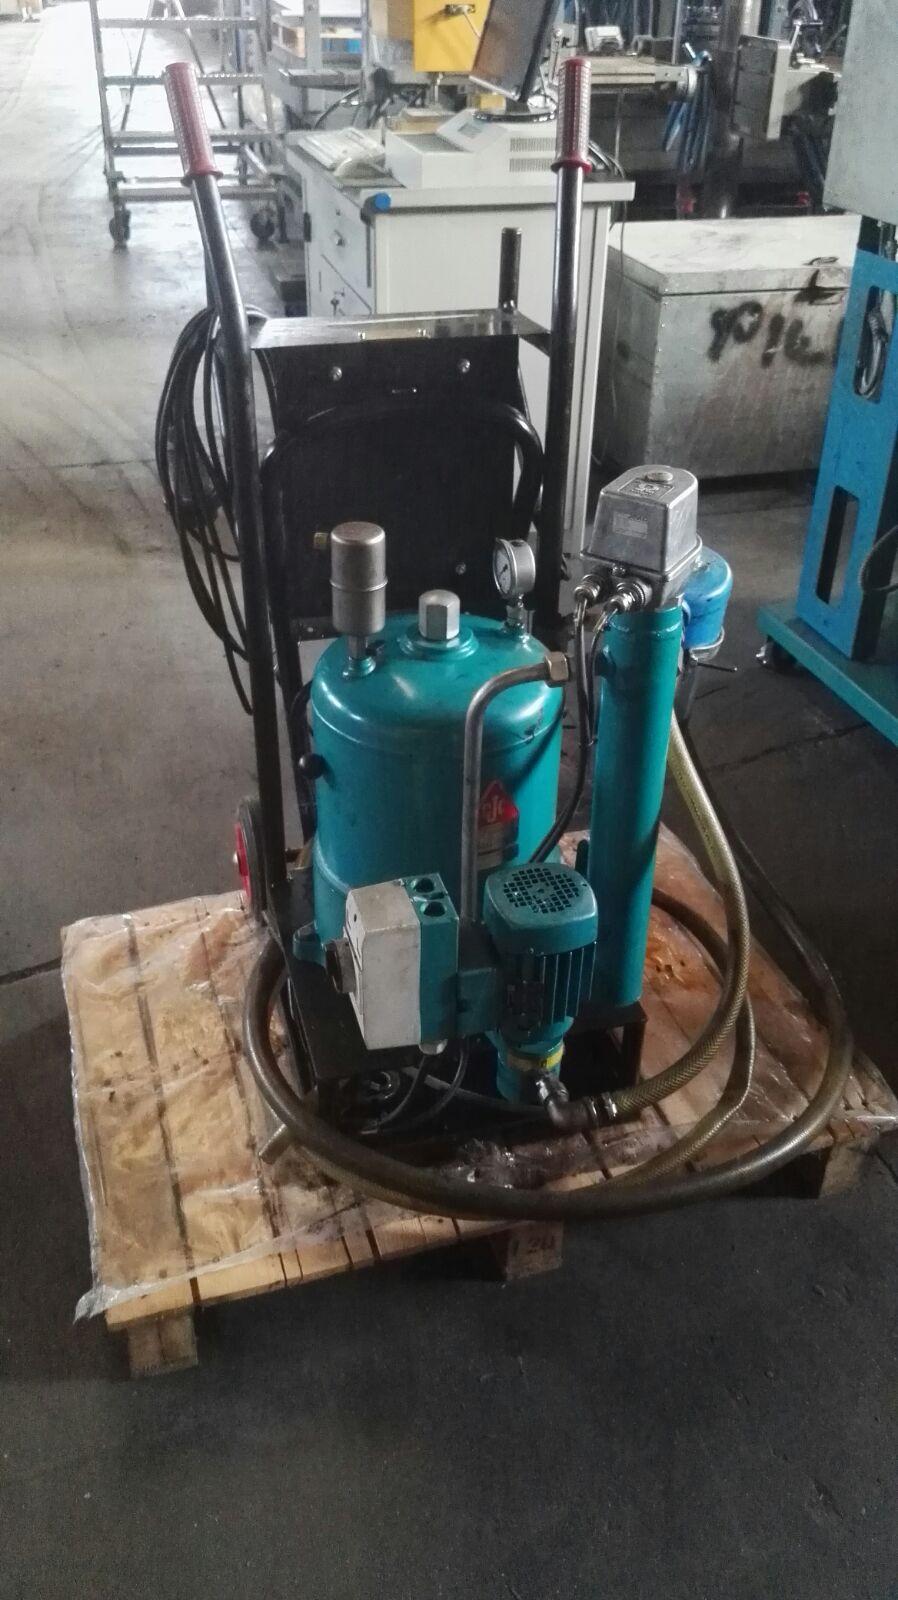 Pump sucks / filters oil C.C JENSEN